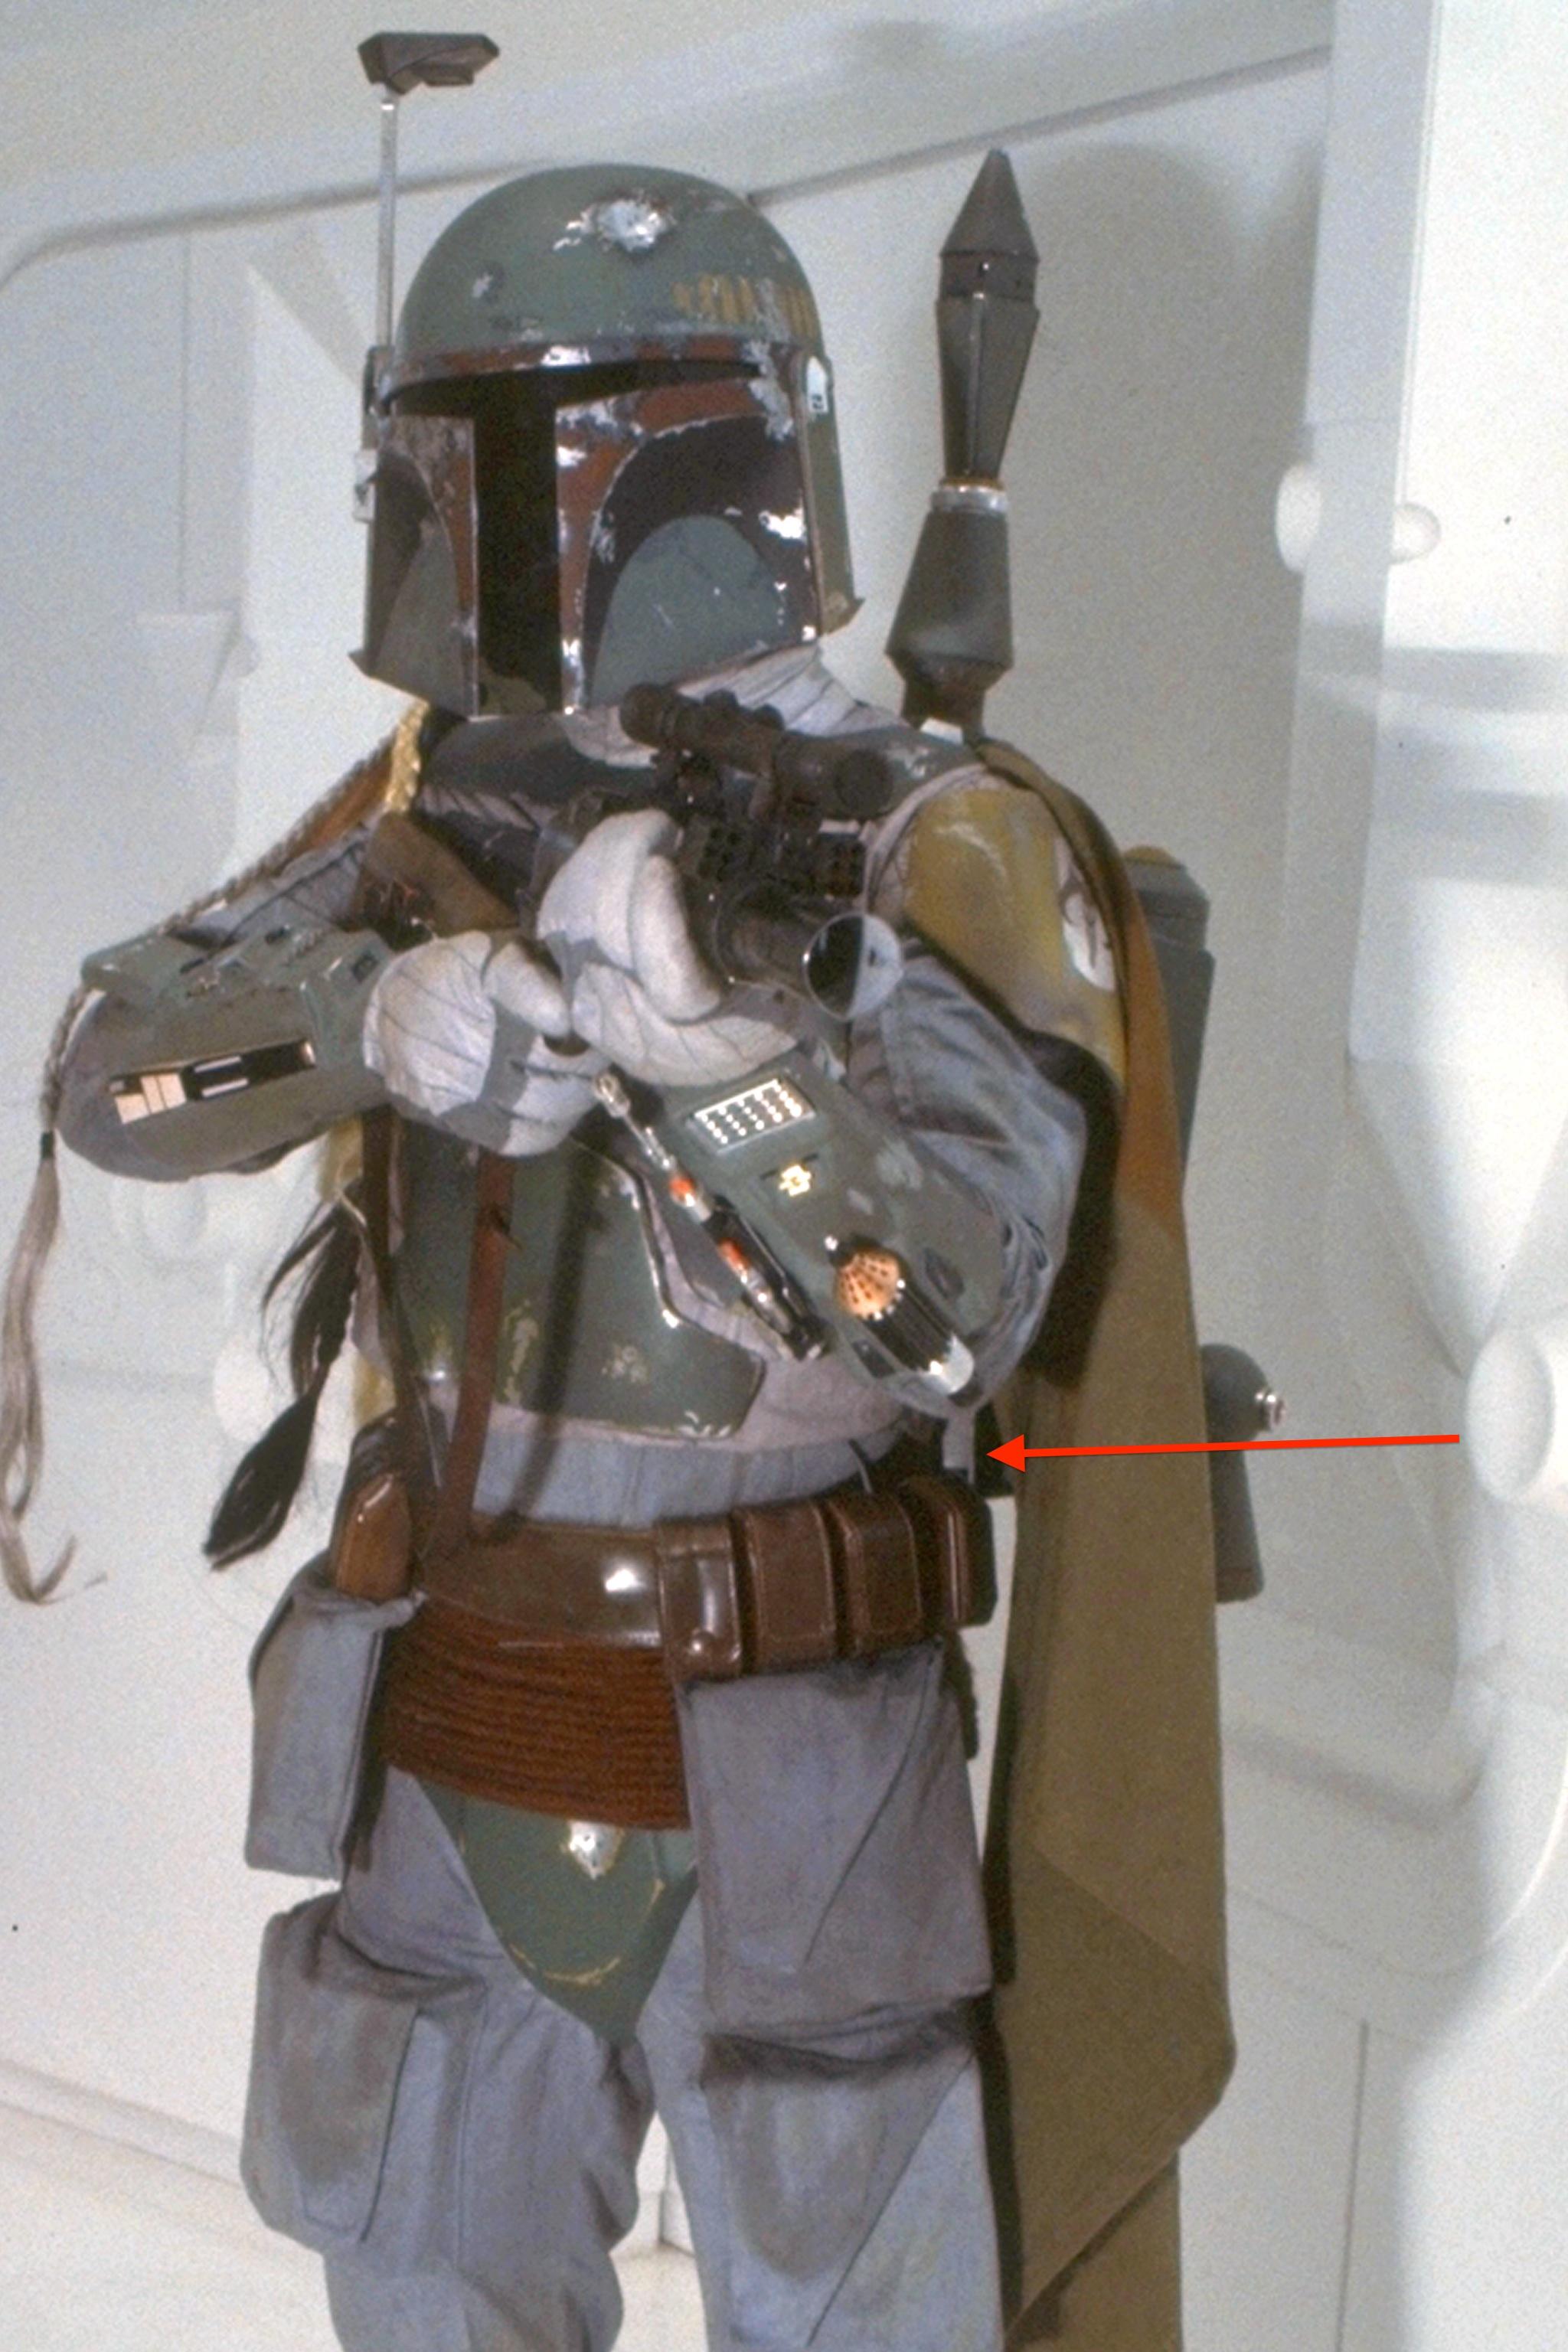 Boba-Fett-Costume-Empire-Strikes-Back-Jetpackplacement2 copy.jpg